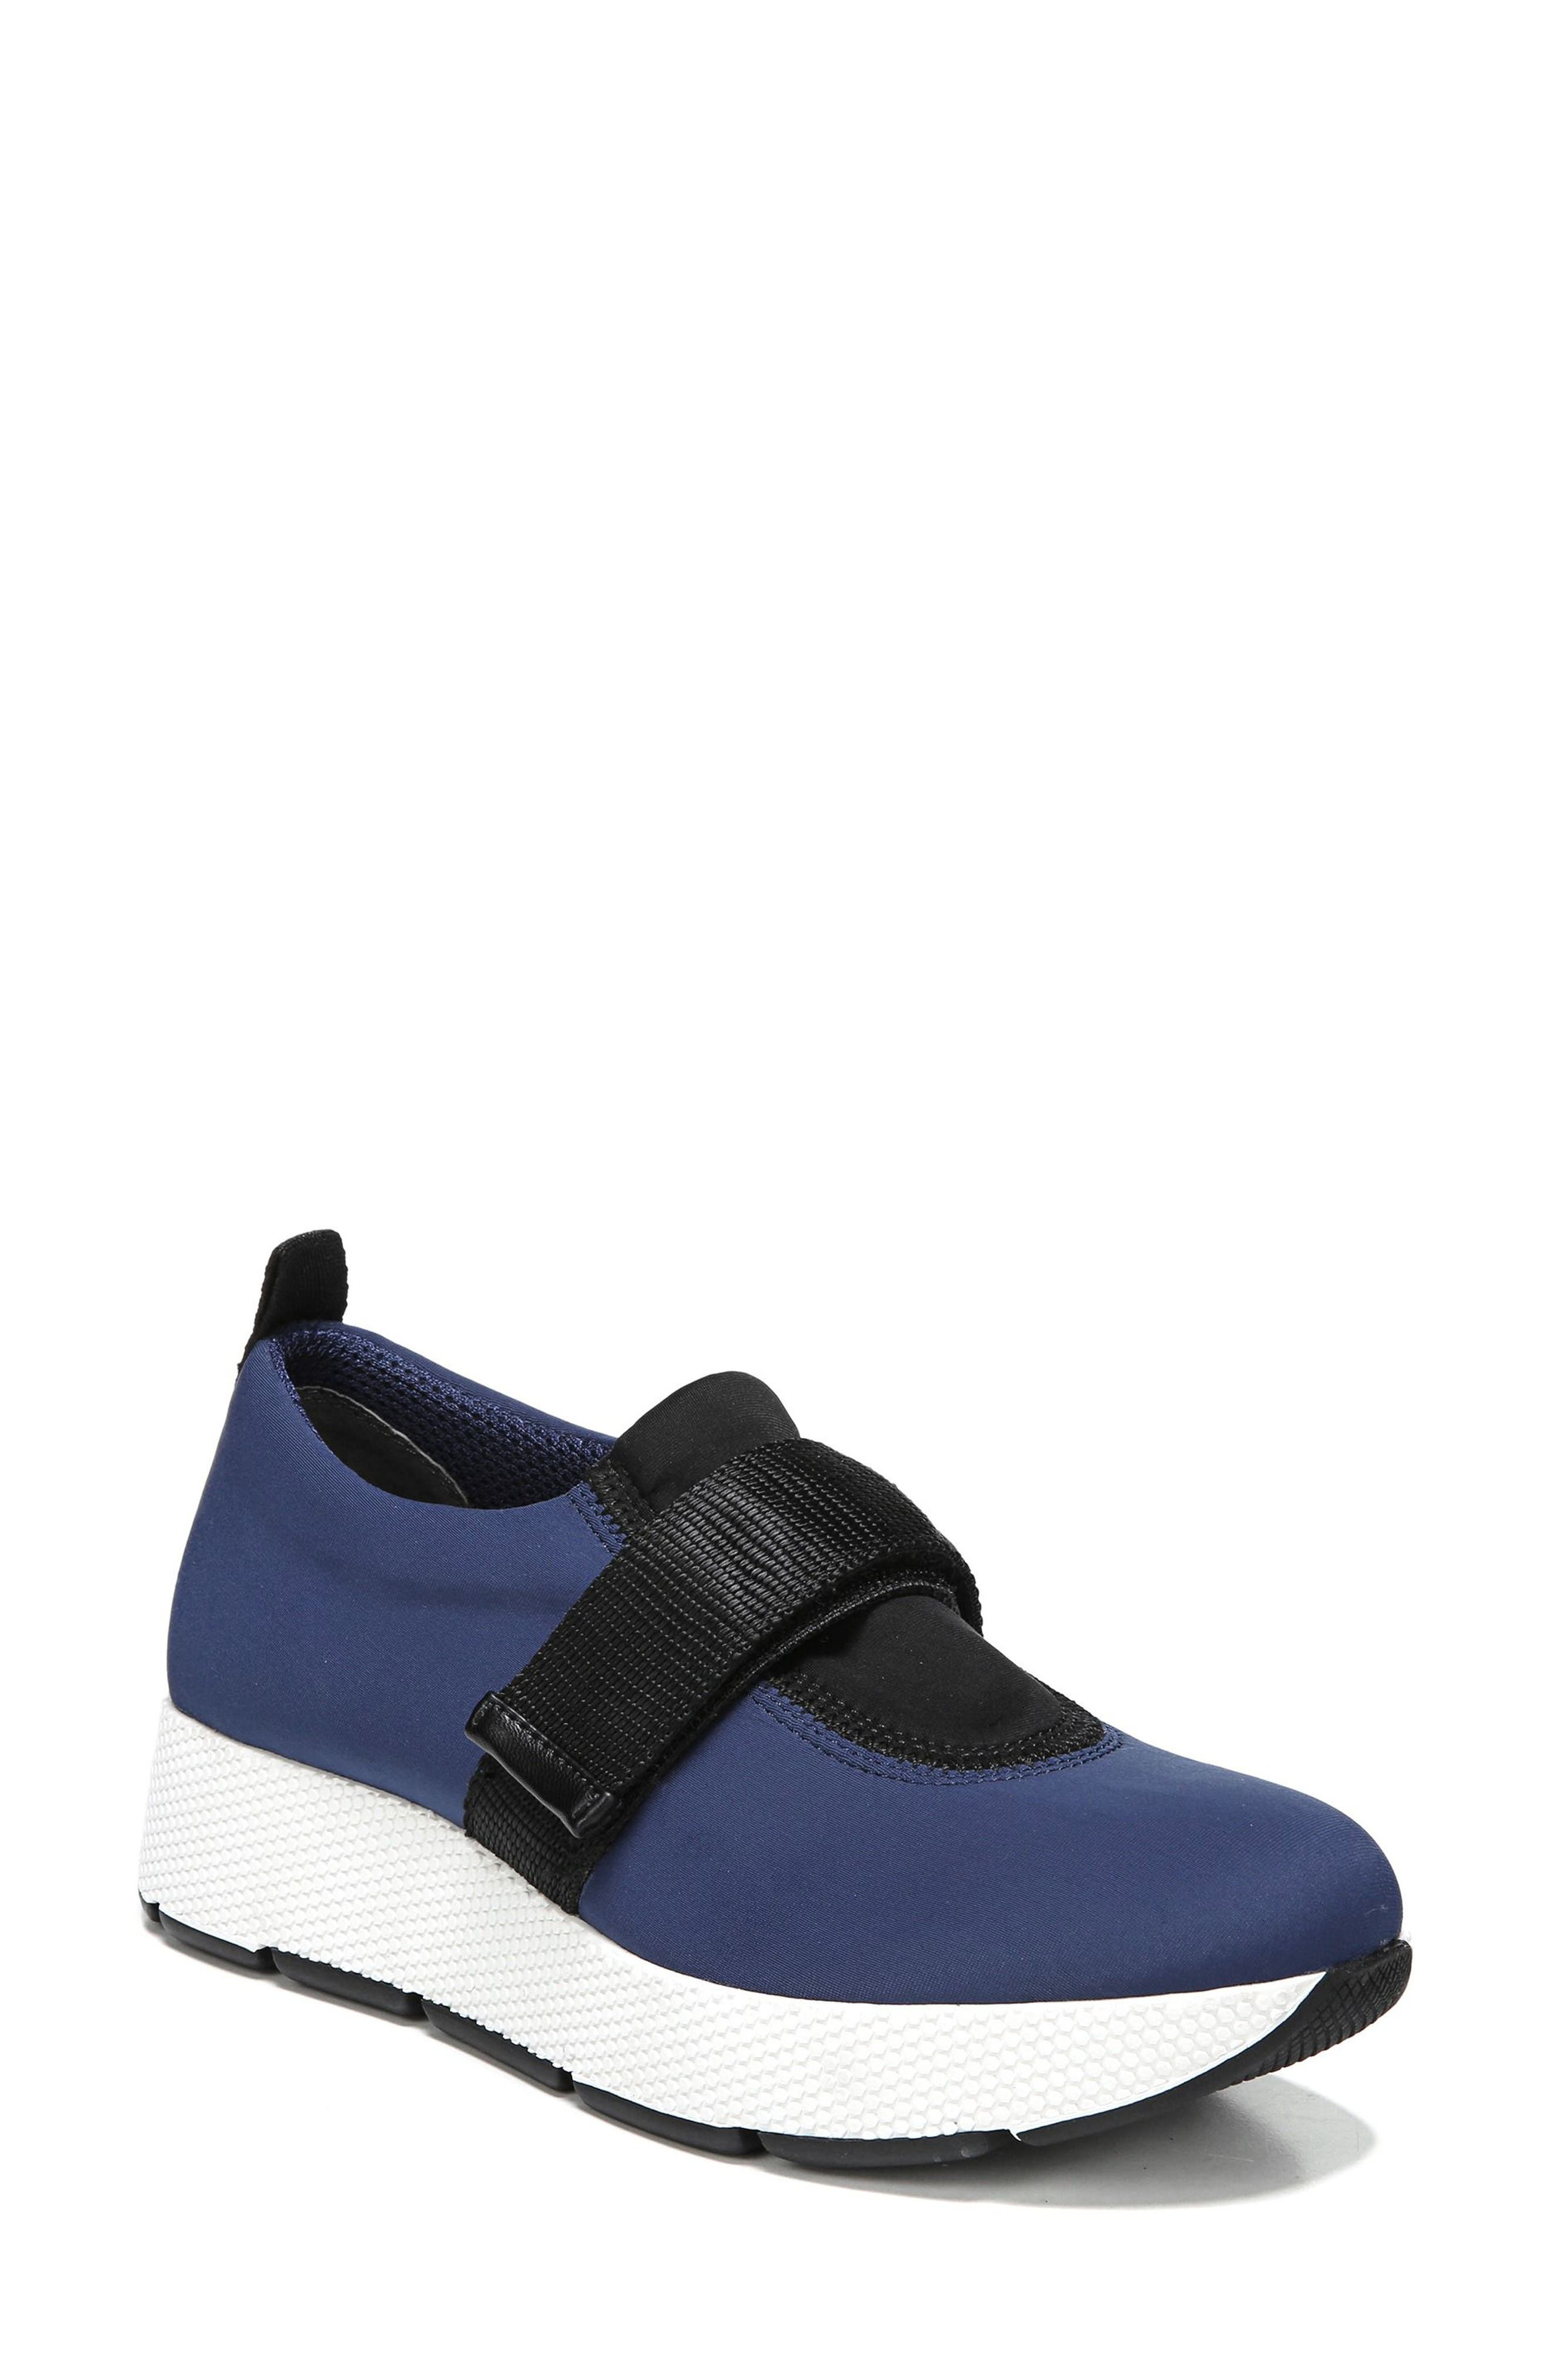 Odella Slip-On Sneaker,                             Main thumbnail 1, color,                             Navy Fabric